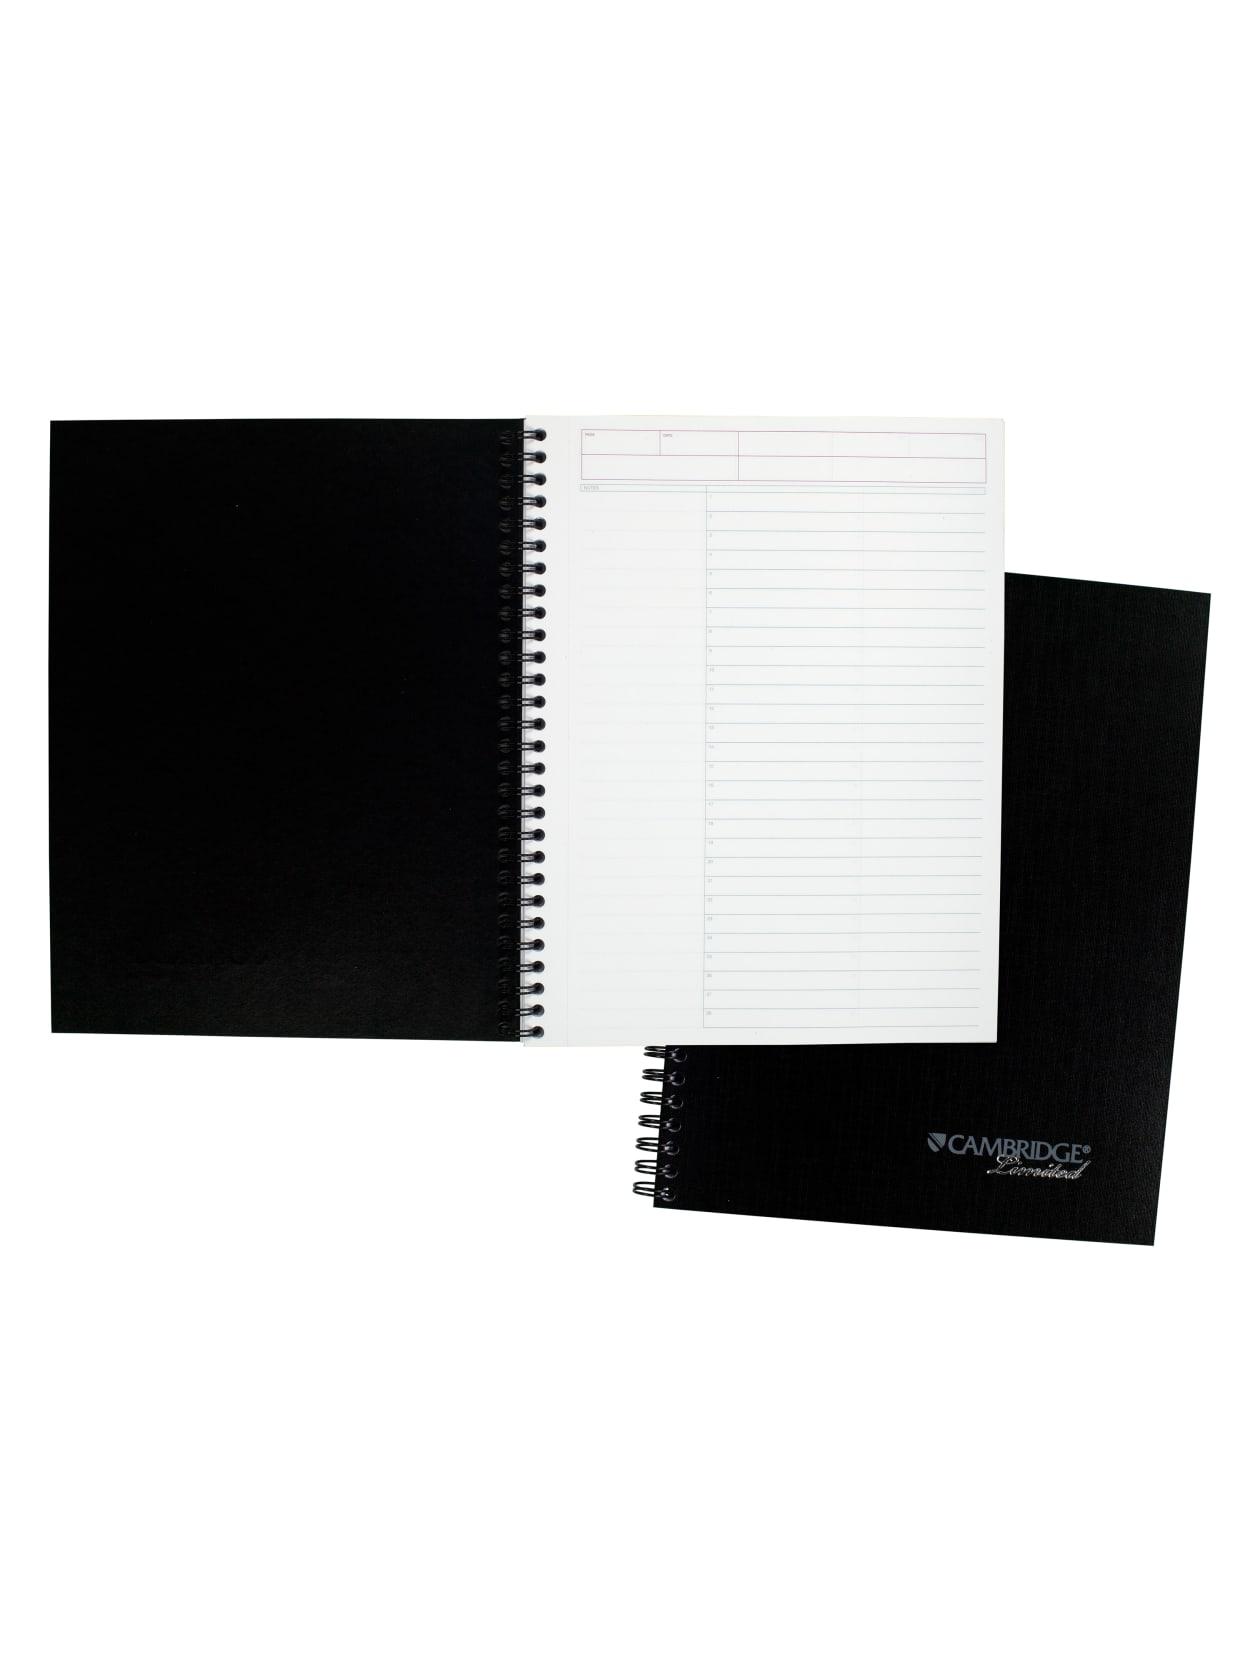 Nipple /SCH 80 Black NOM: 1 X 7 Seamless